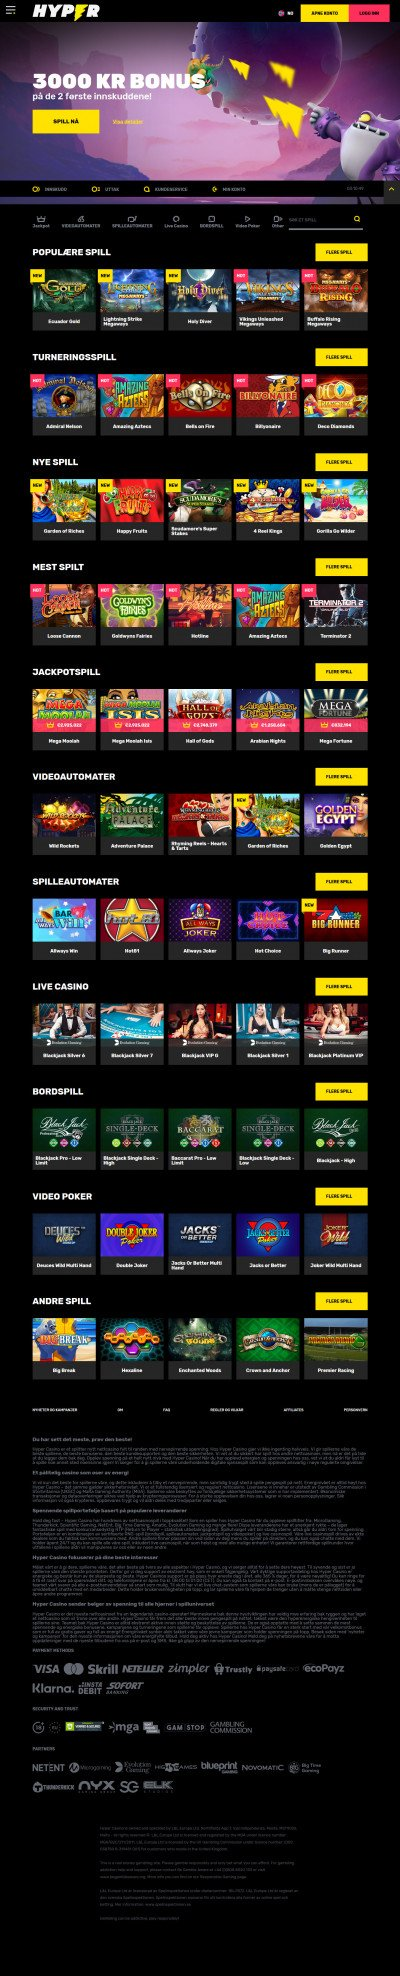 Hyper Casino Screenshot